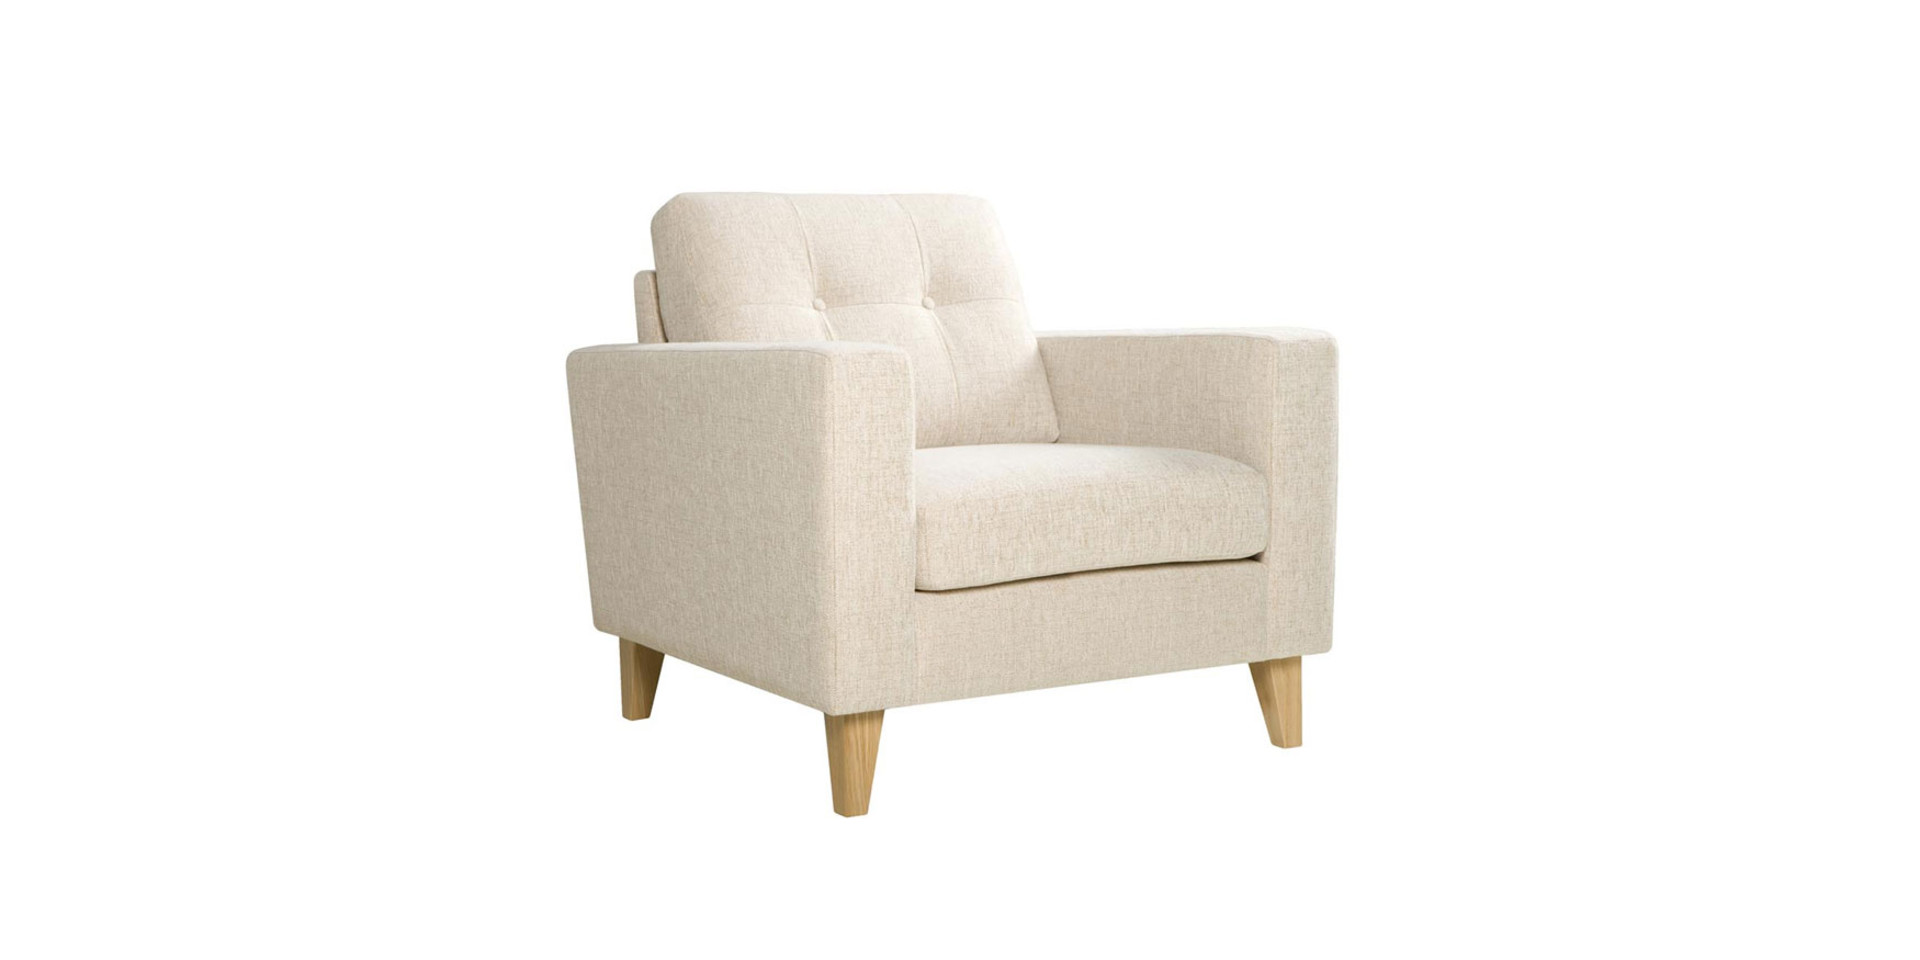 sits-giorgio-fauteuil-armchair_riscorunner109049_light_beige_4_0